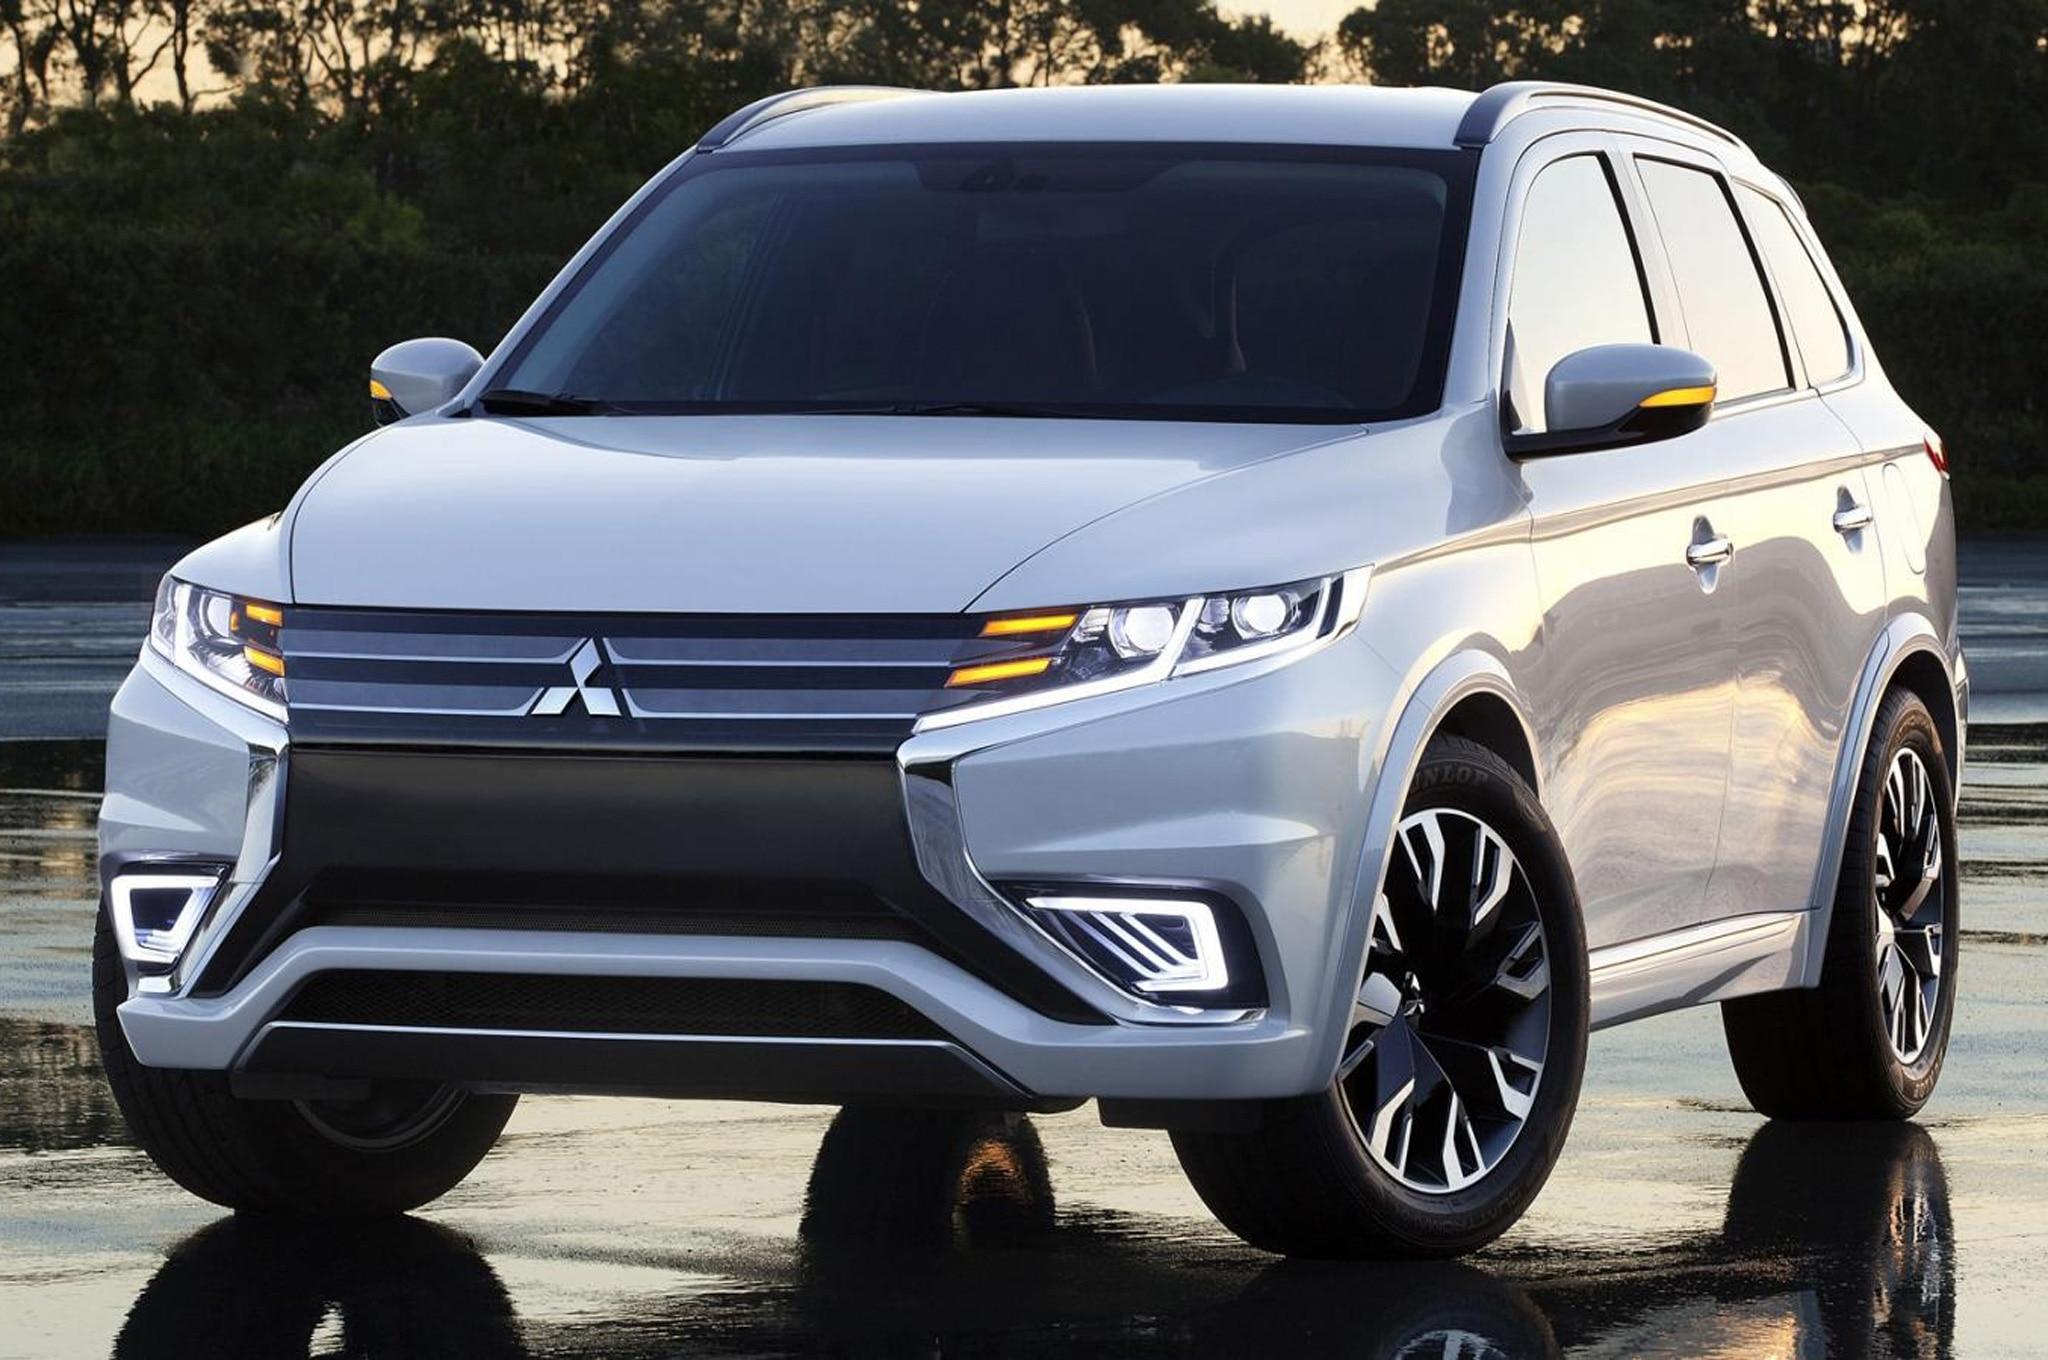 Mitsubishi Outlander PHEV Concept S Front Three Quarter 2